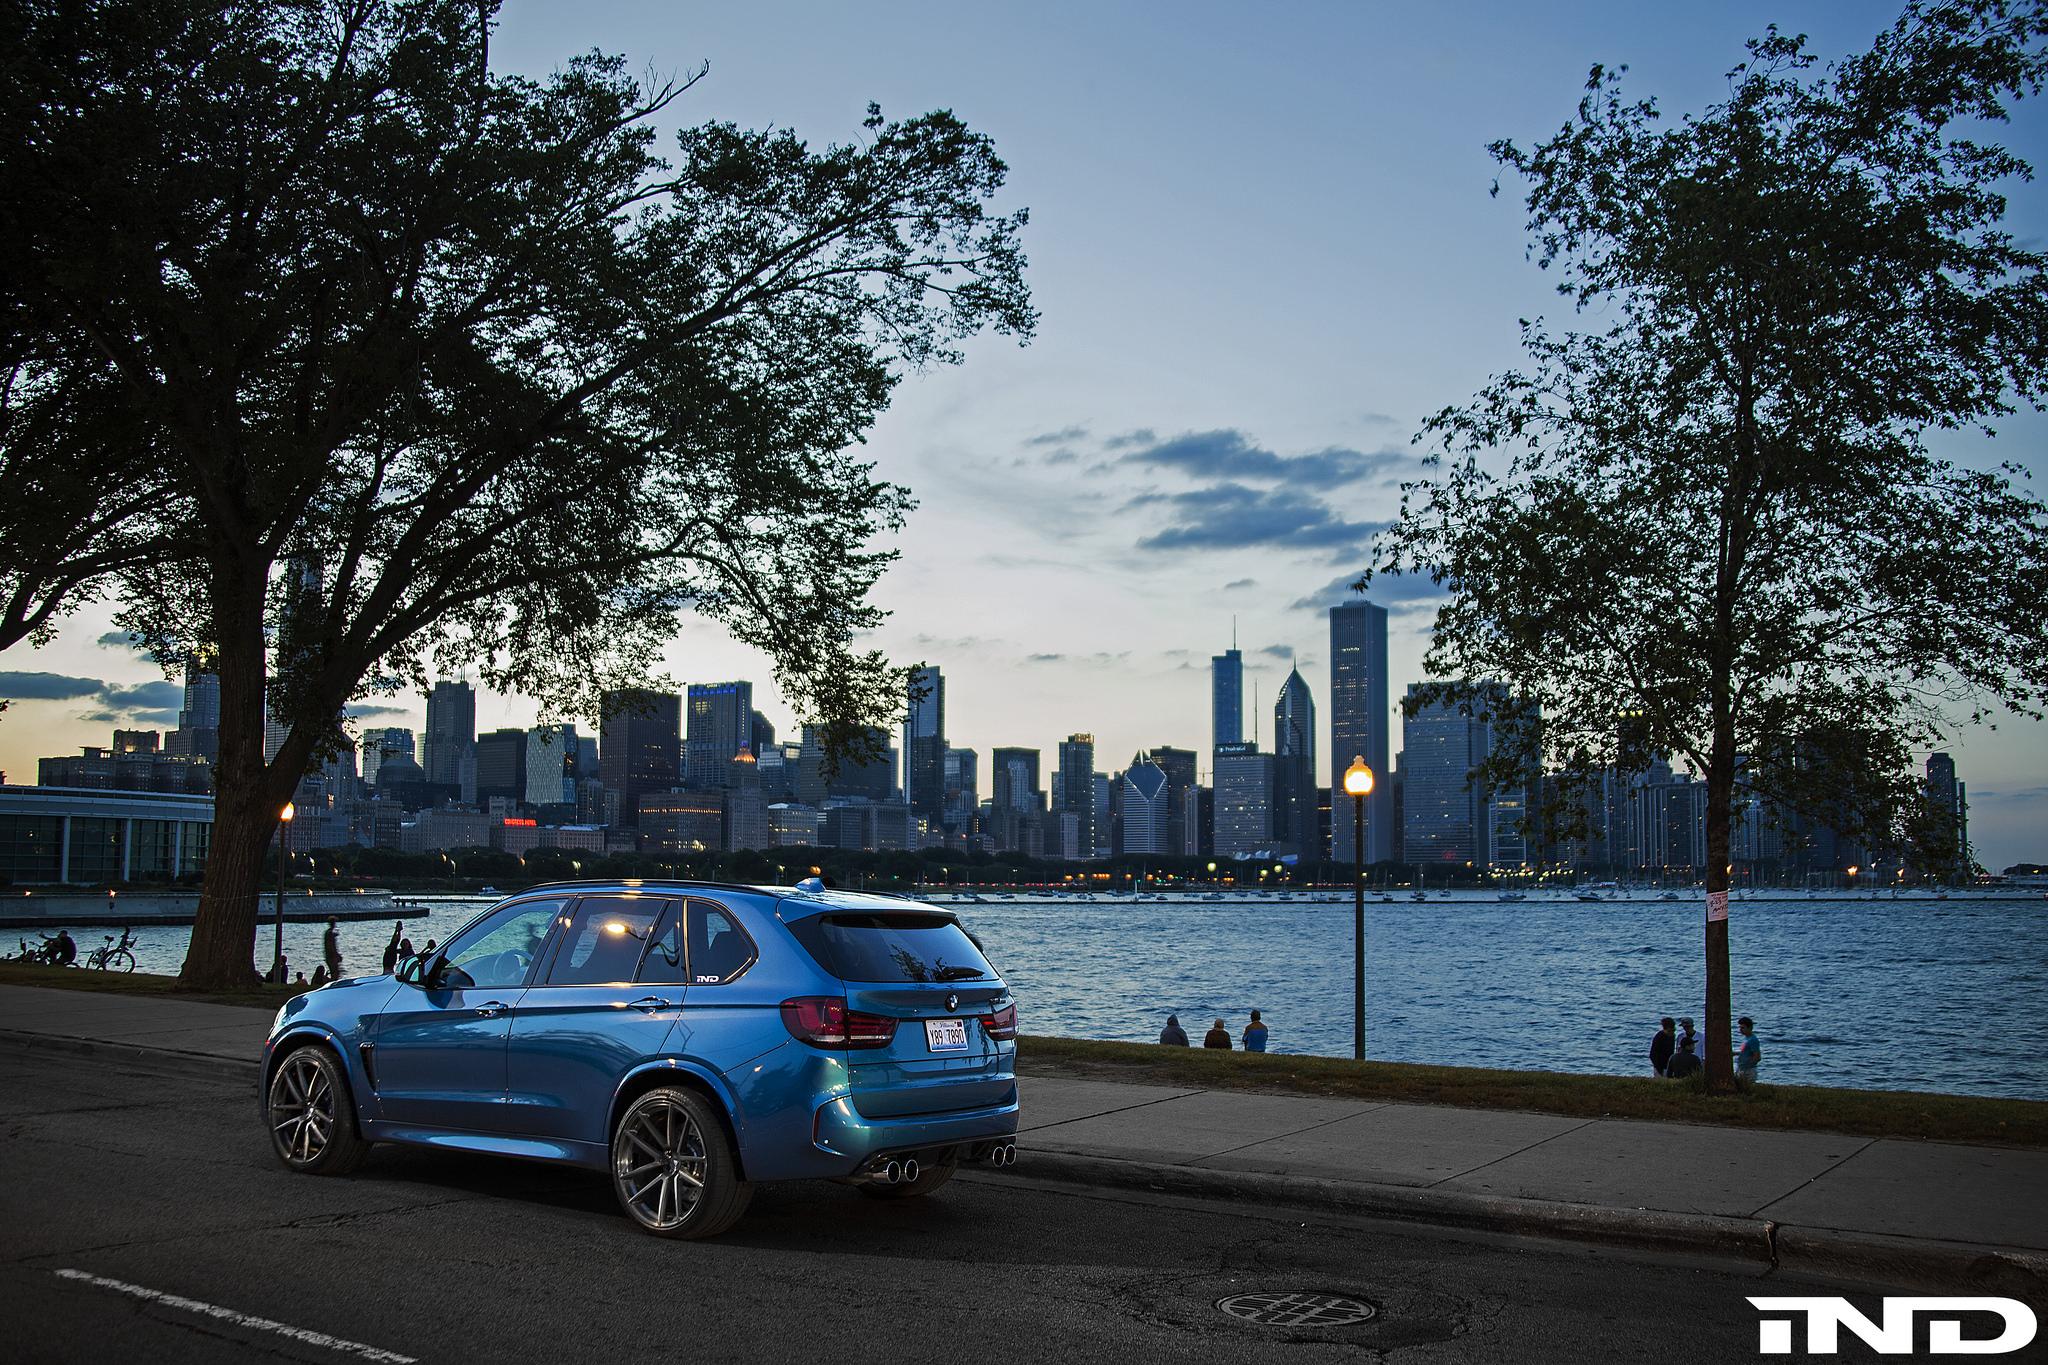 A Clean IND Long Beach Blue Metallic BMW X5 M Project 1